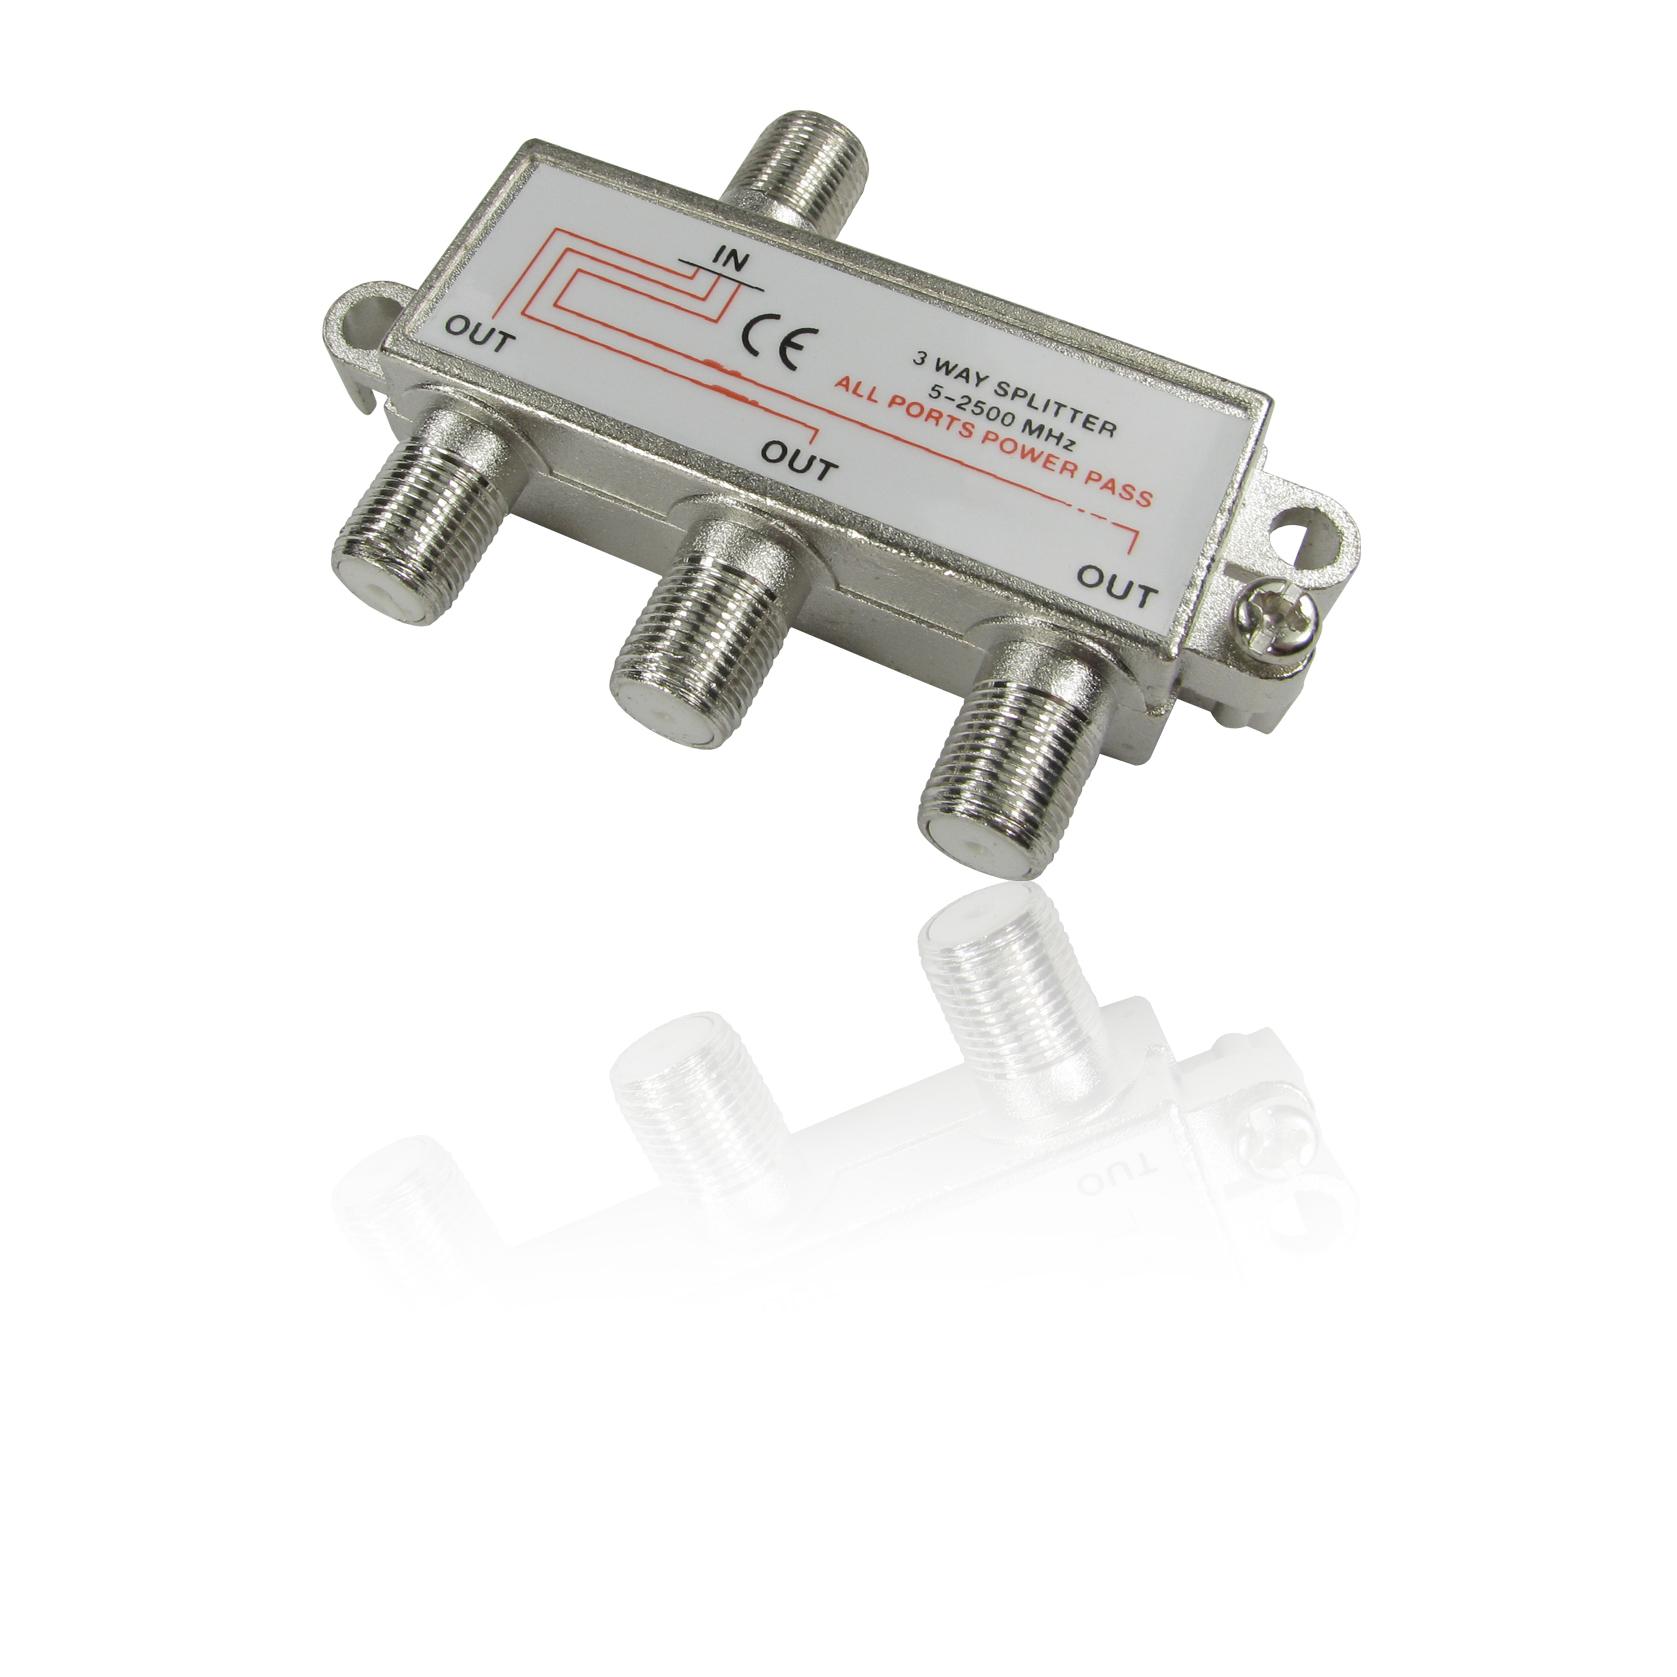 3 Way Cable Splitter : Way coax splitter f connector female digital tv